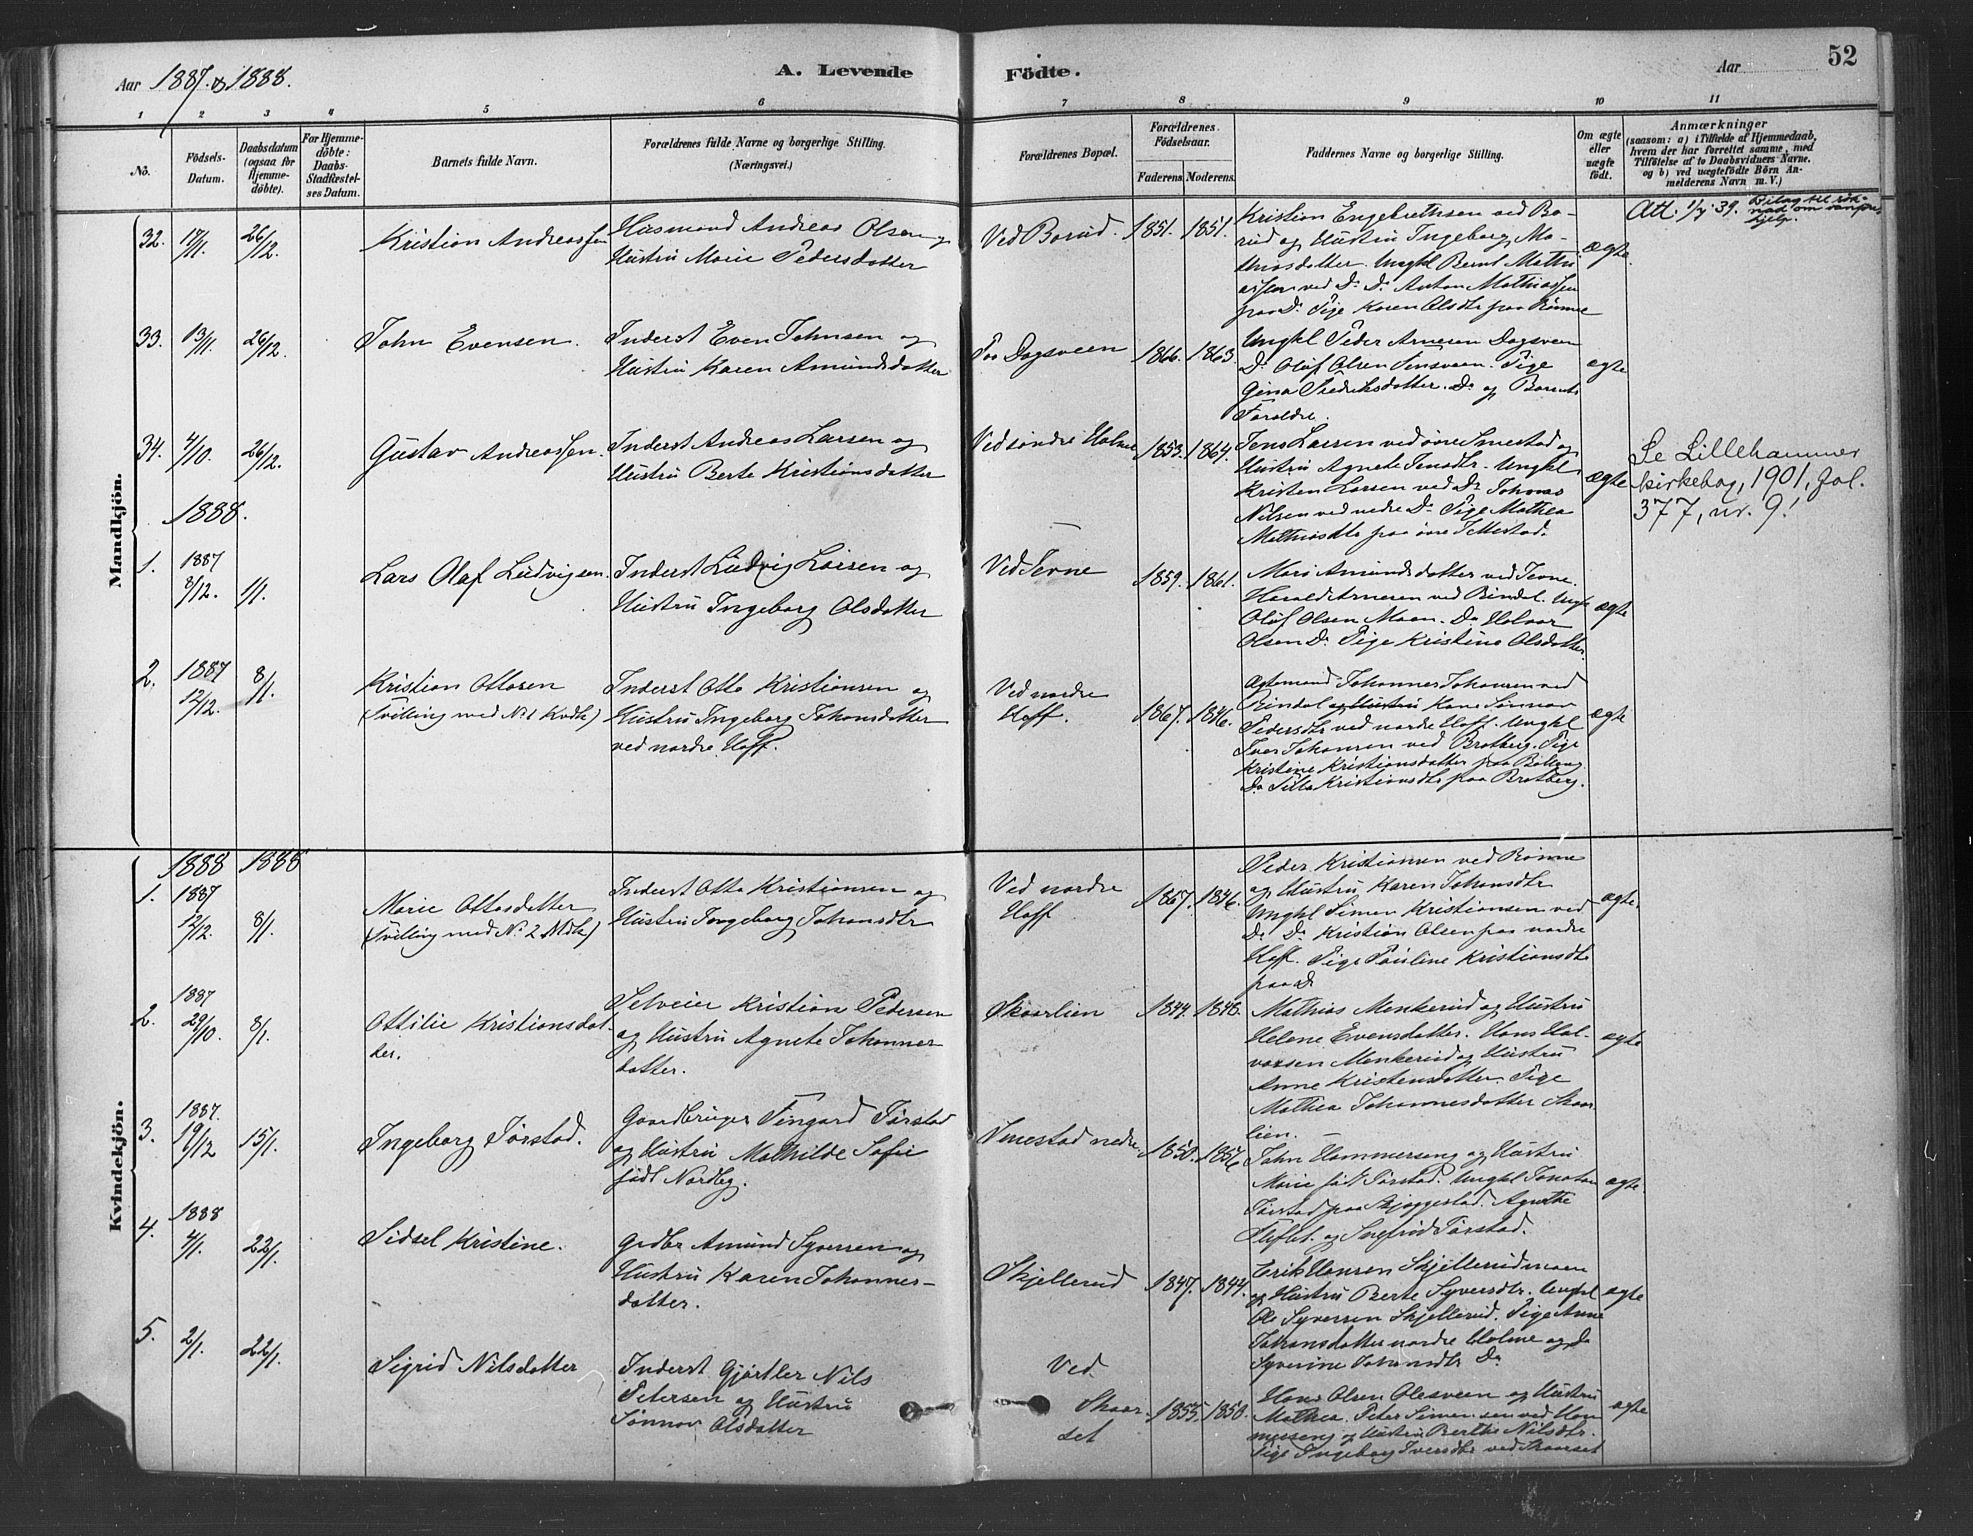 SAH, Fåberg prestekontor, Ministerialbok nr. 9, 1879-1898, s. 52